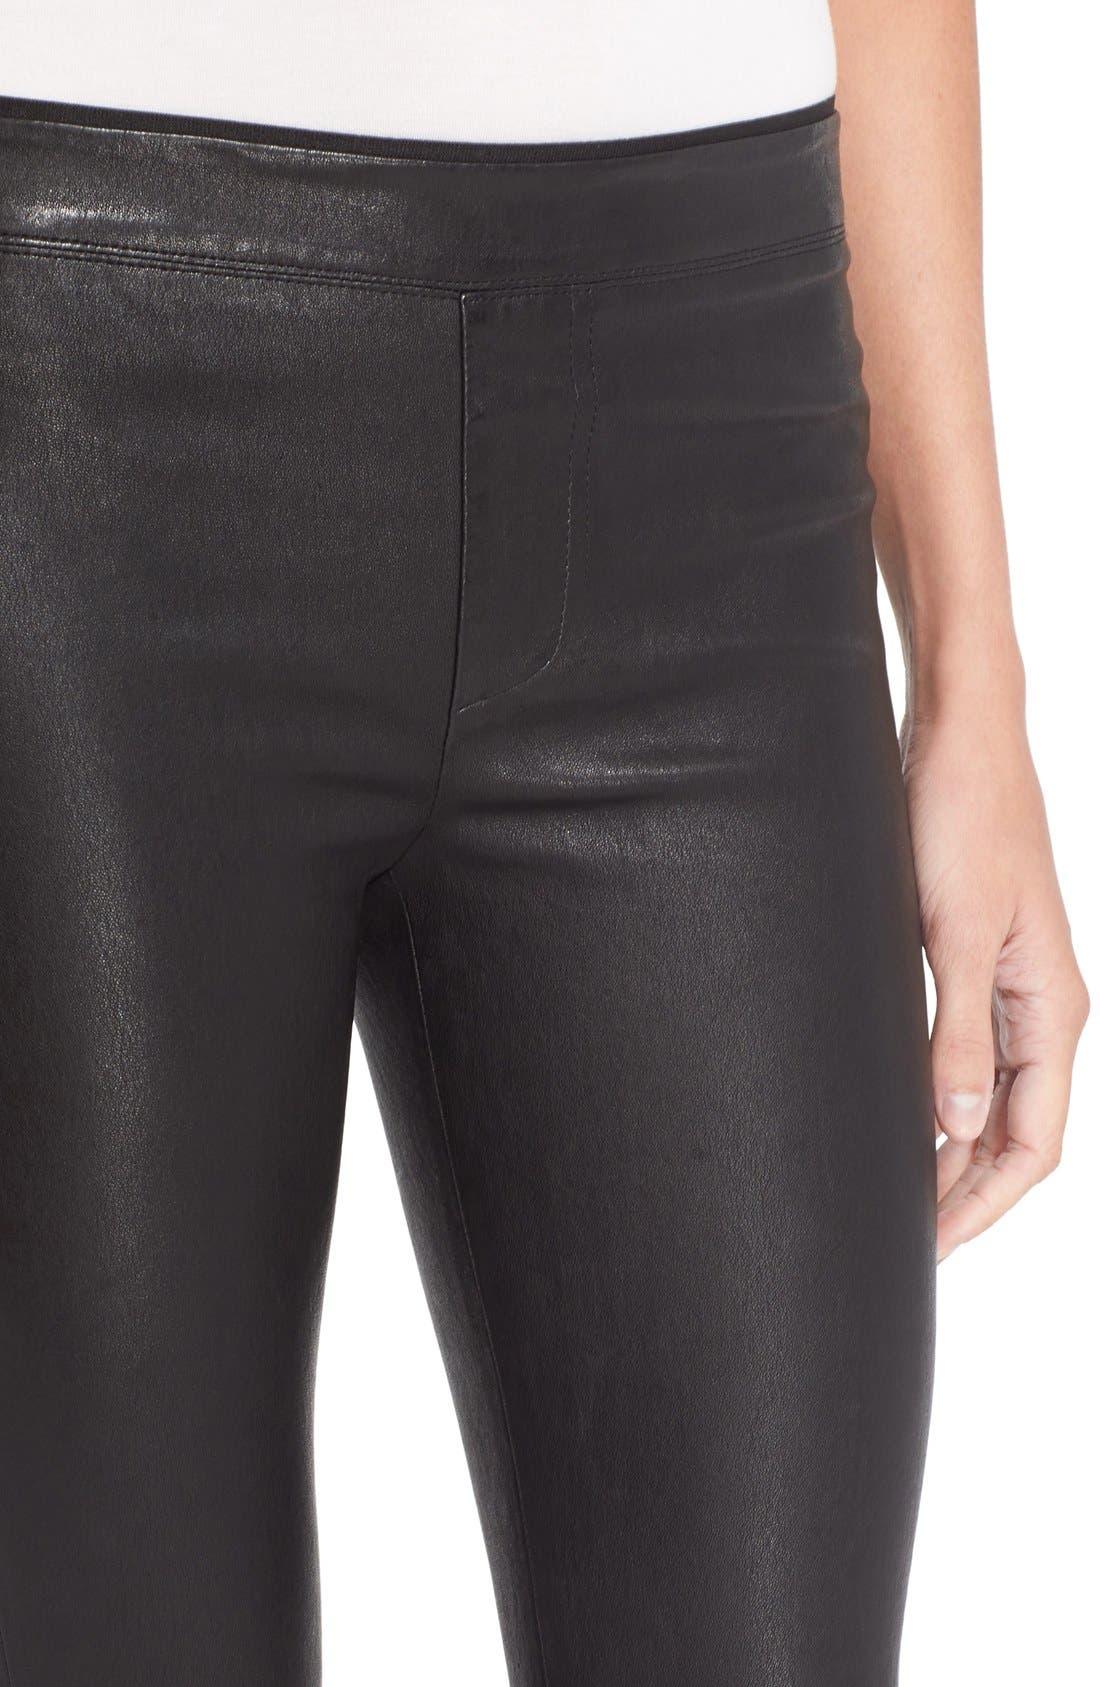 Stretch Lambskin Leather Leggings,                             Alternate thumbnail 11, color,                             BLACK